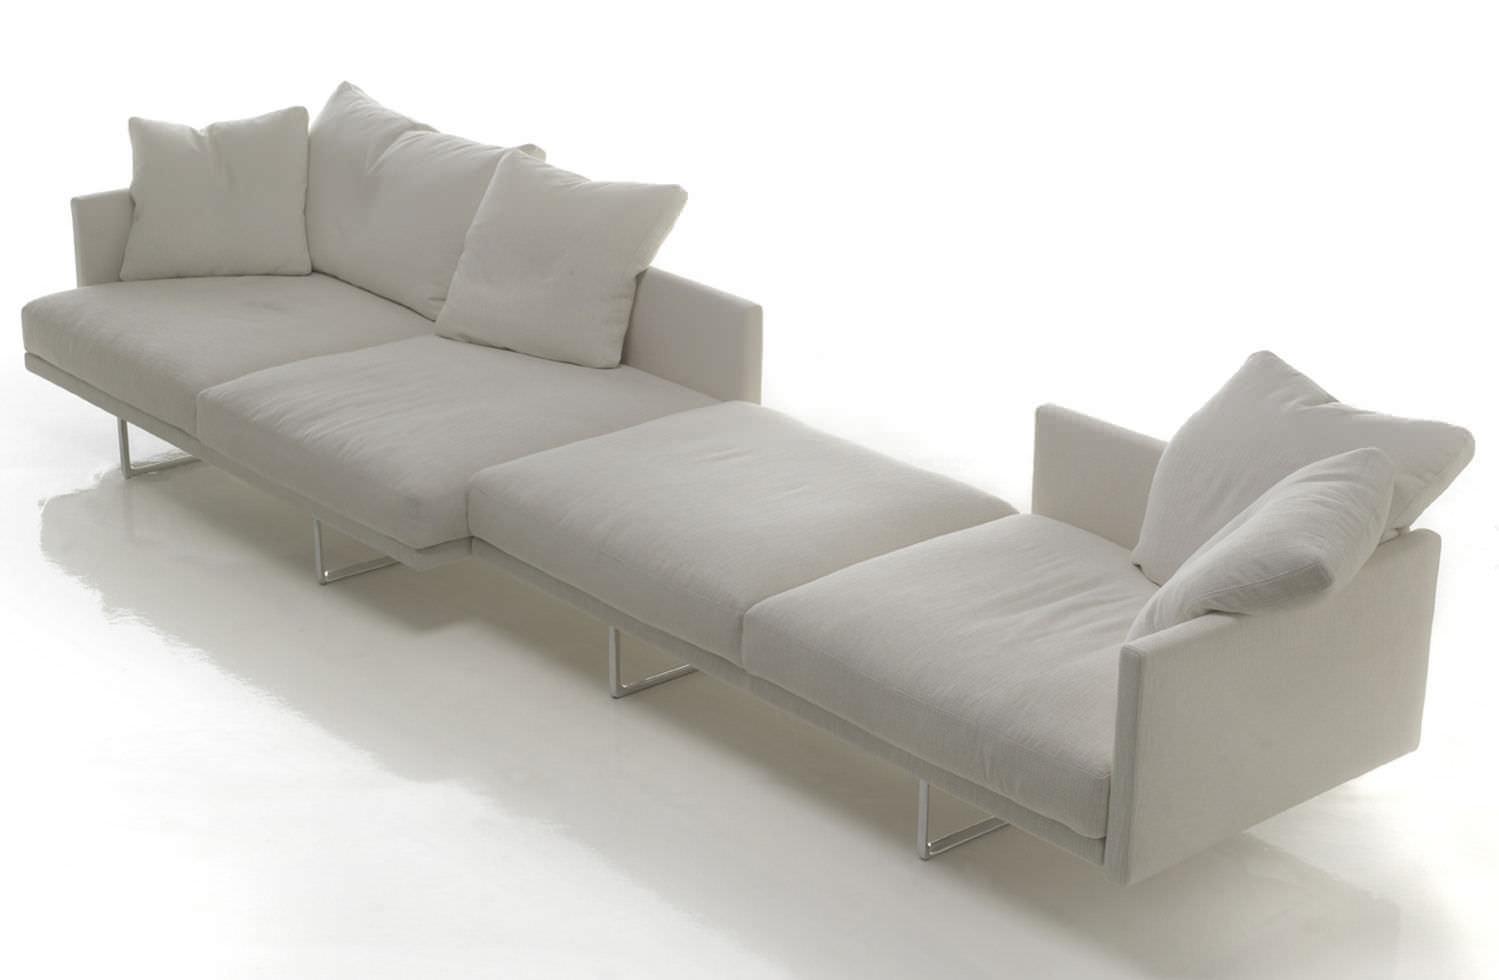 Sofas Center : Img 7705 L Incredible Mah Jong Modular Sofa Image Inside Modular Sofas (View 3 of 20)